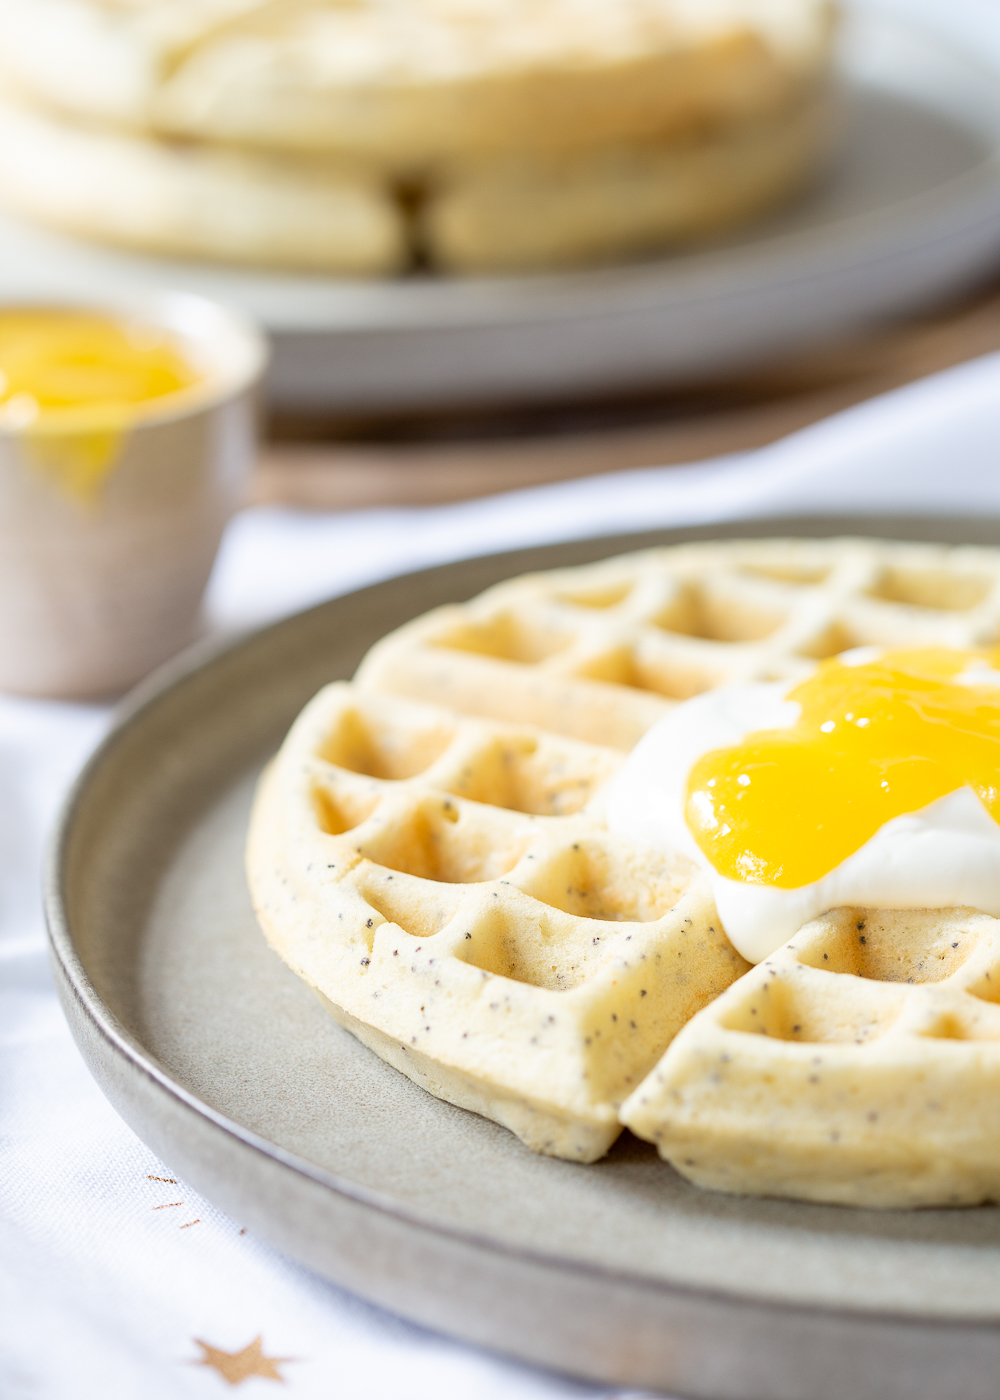 Citroen-maanzaad wafels met lemon curd